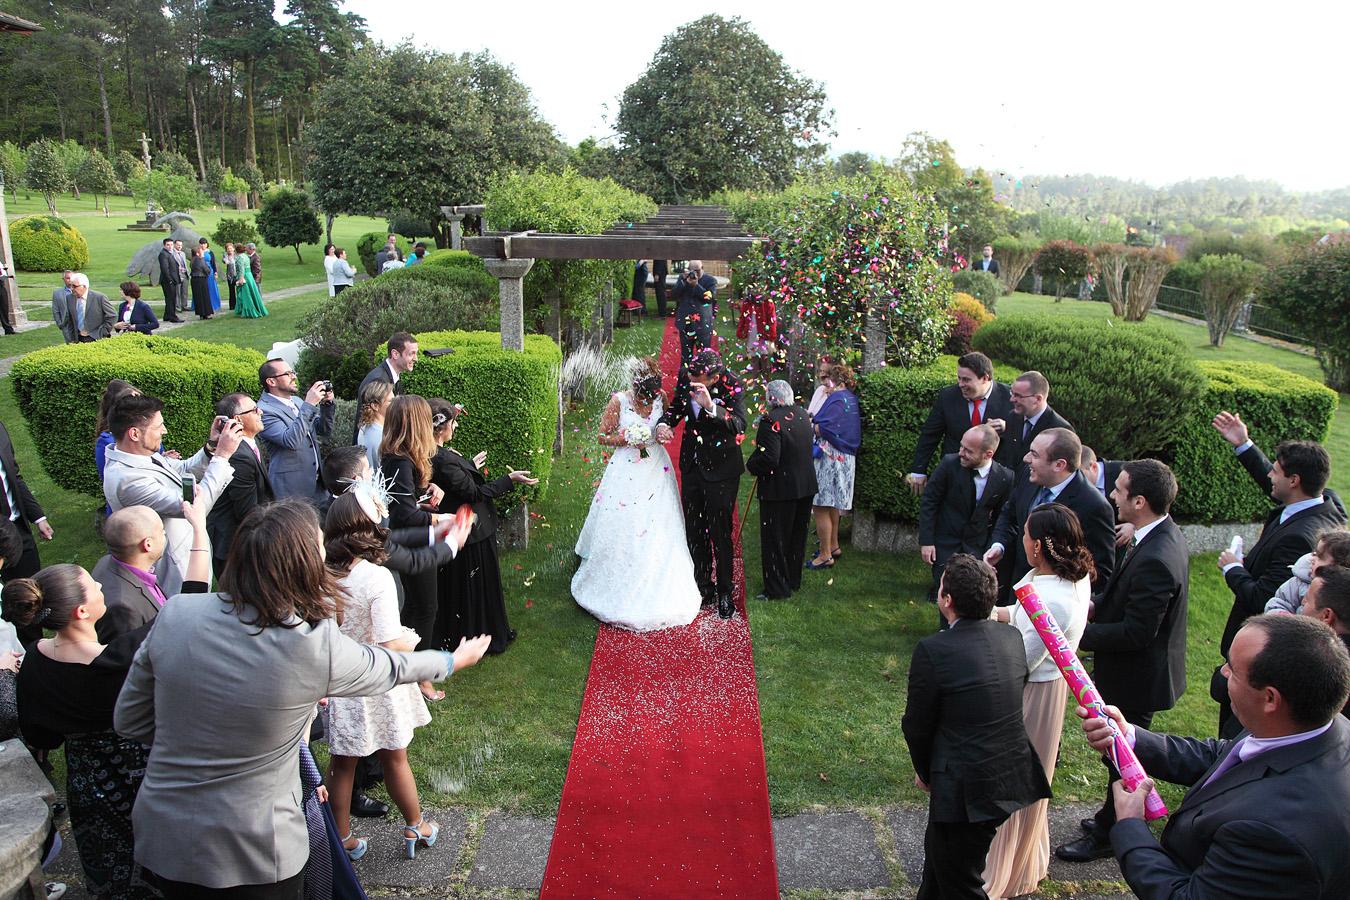 boda-pazo-toxeiriña-ceremonia-civil-alessandro-diana-cambados-vilagarcia-playa-post-boda016